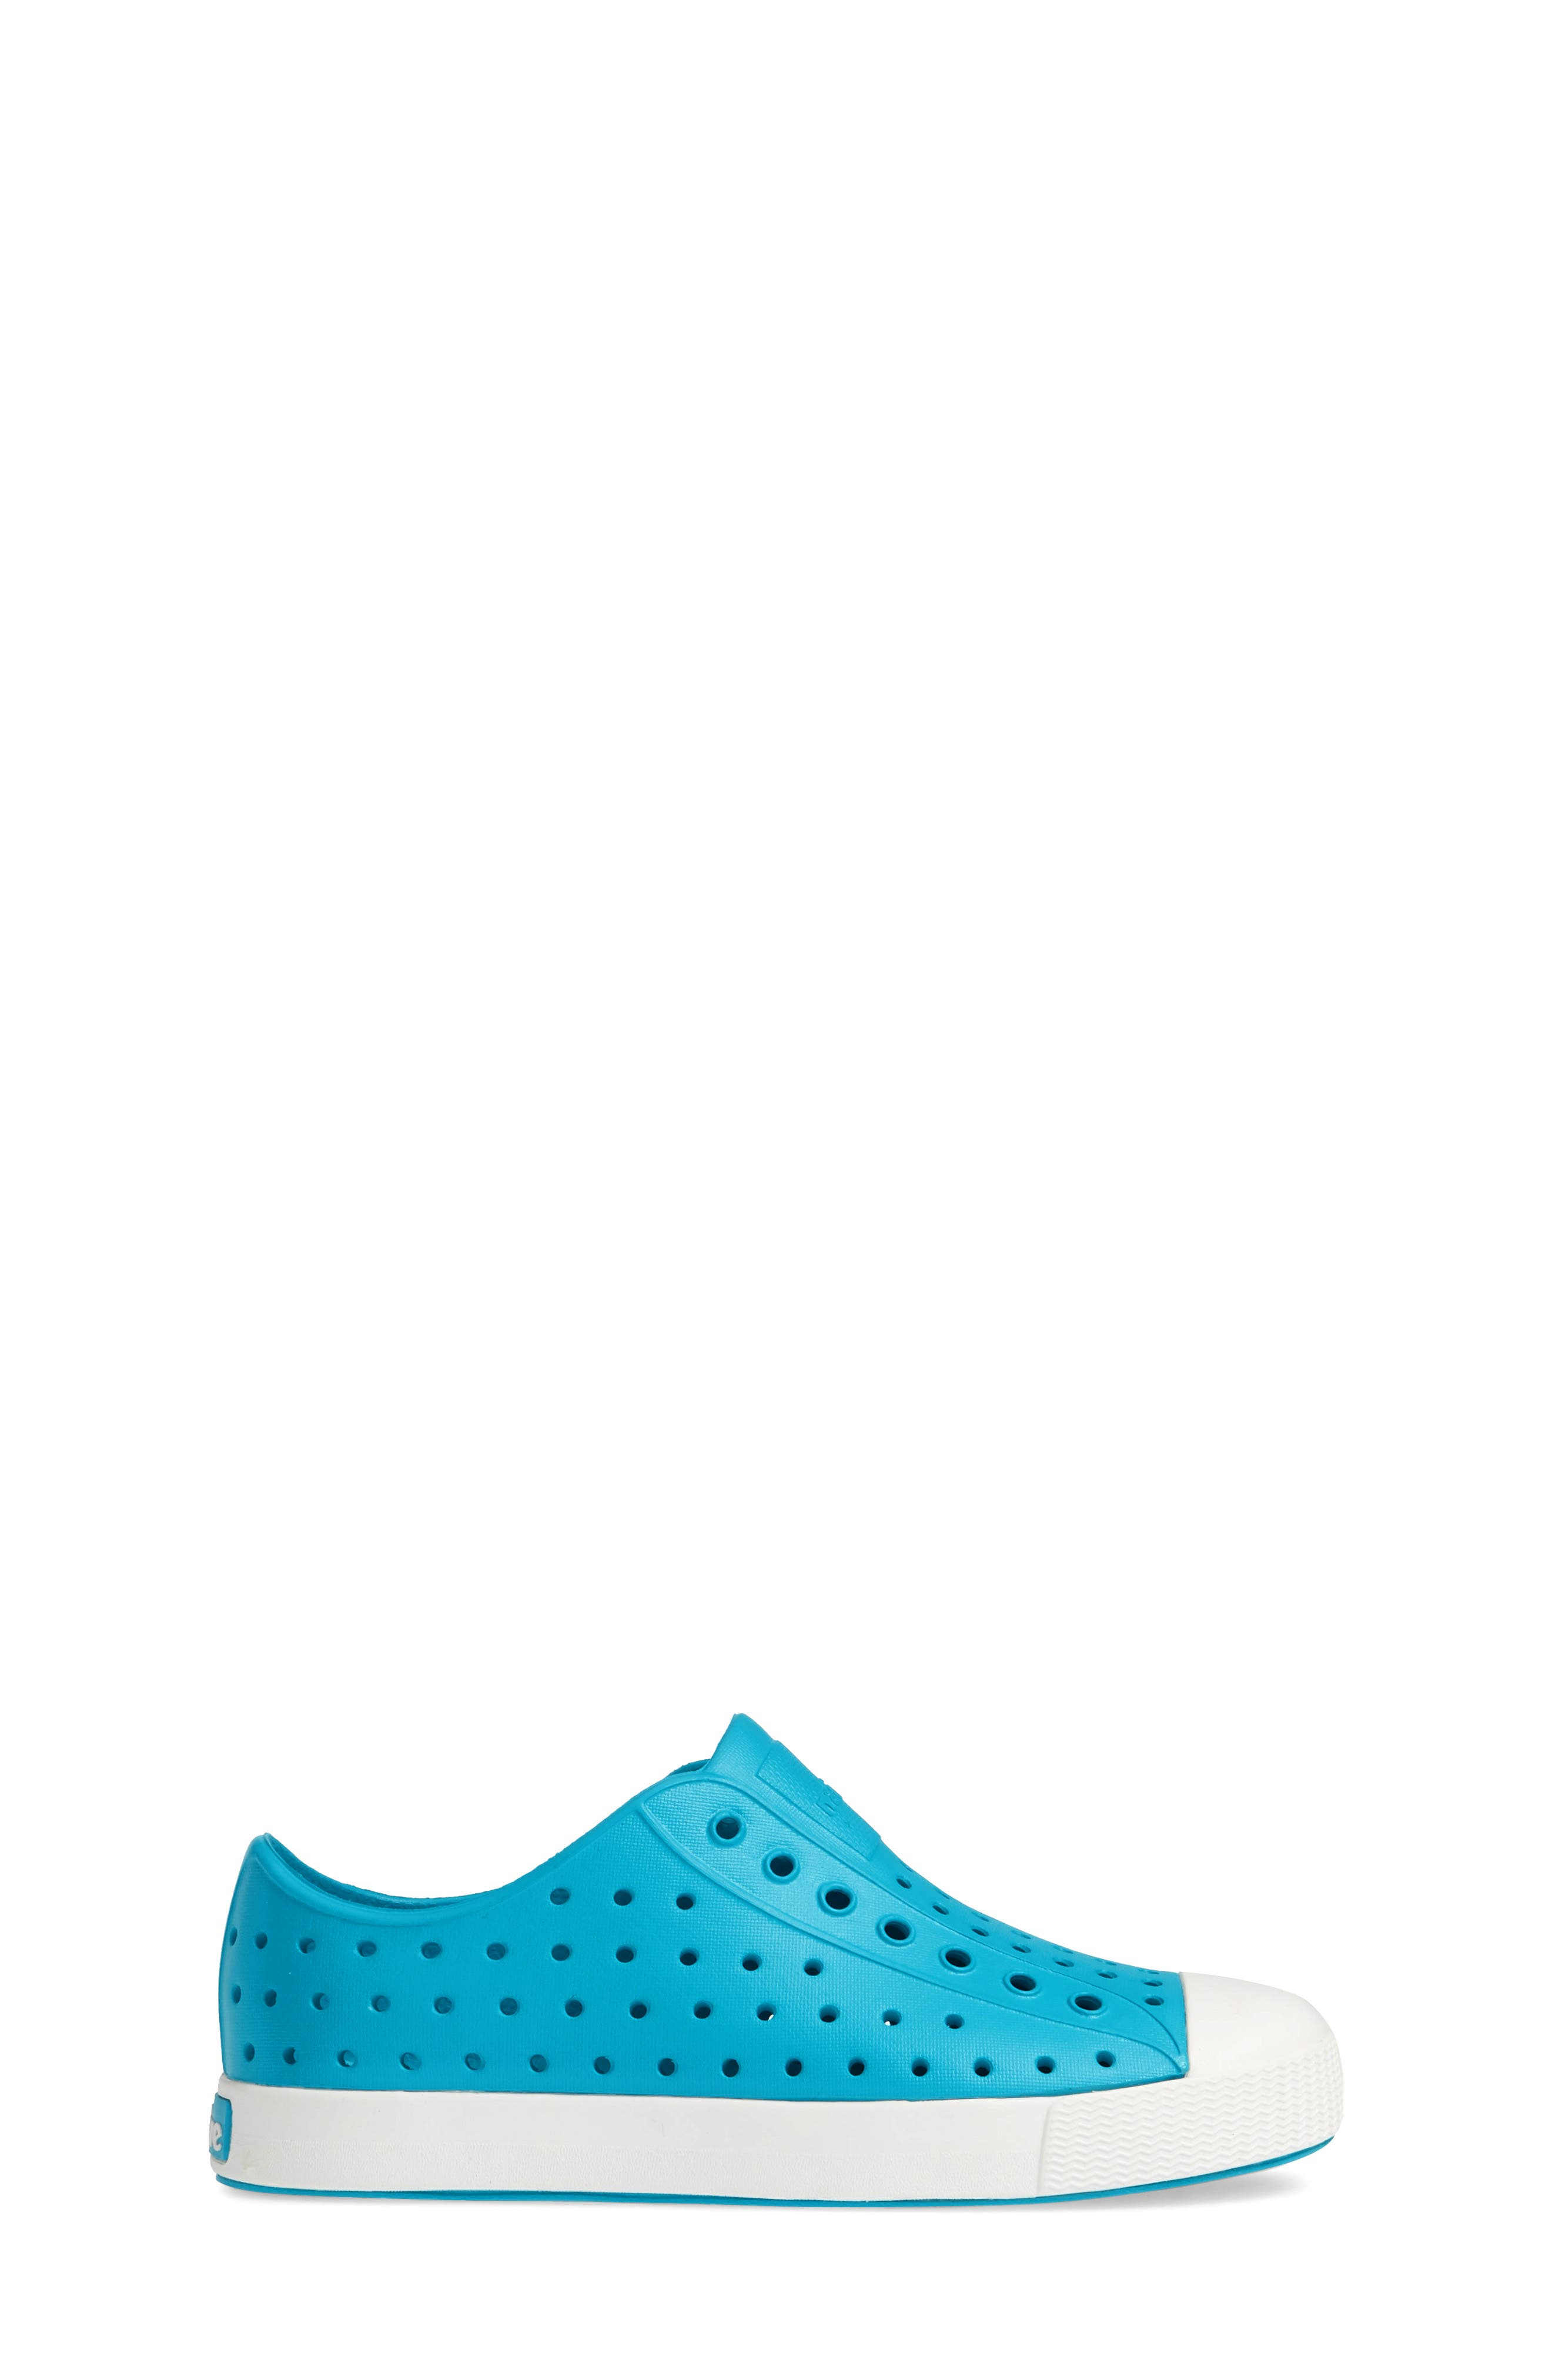 Alternate Image 3  - Native Shoes 'Jefferson' Slip-On Sneaker (Baby, Walker, Toddler, Little Kid & Big Kid)